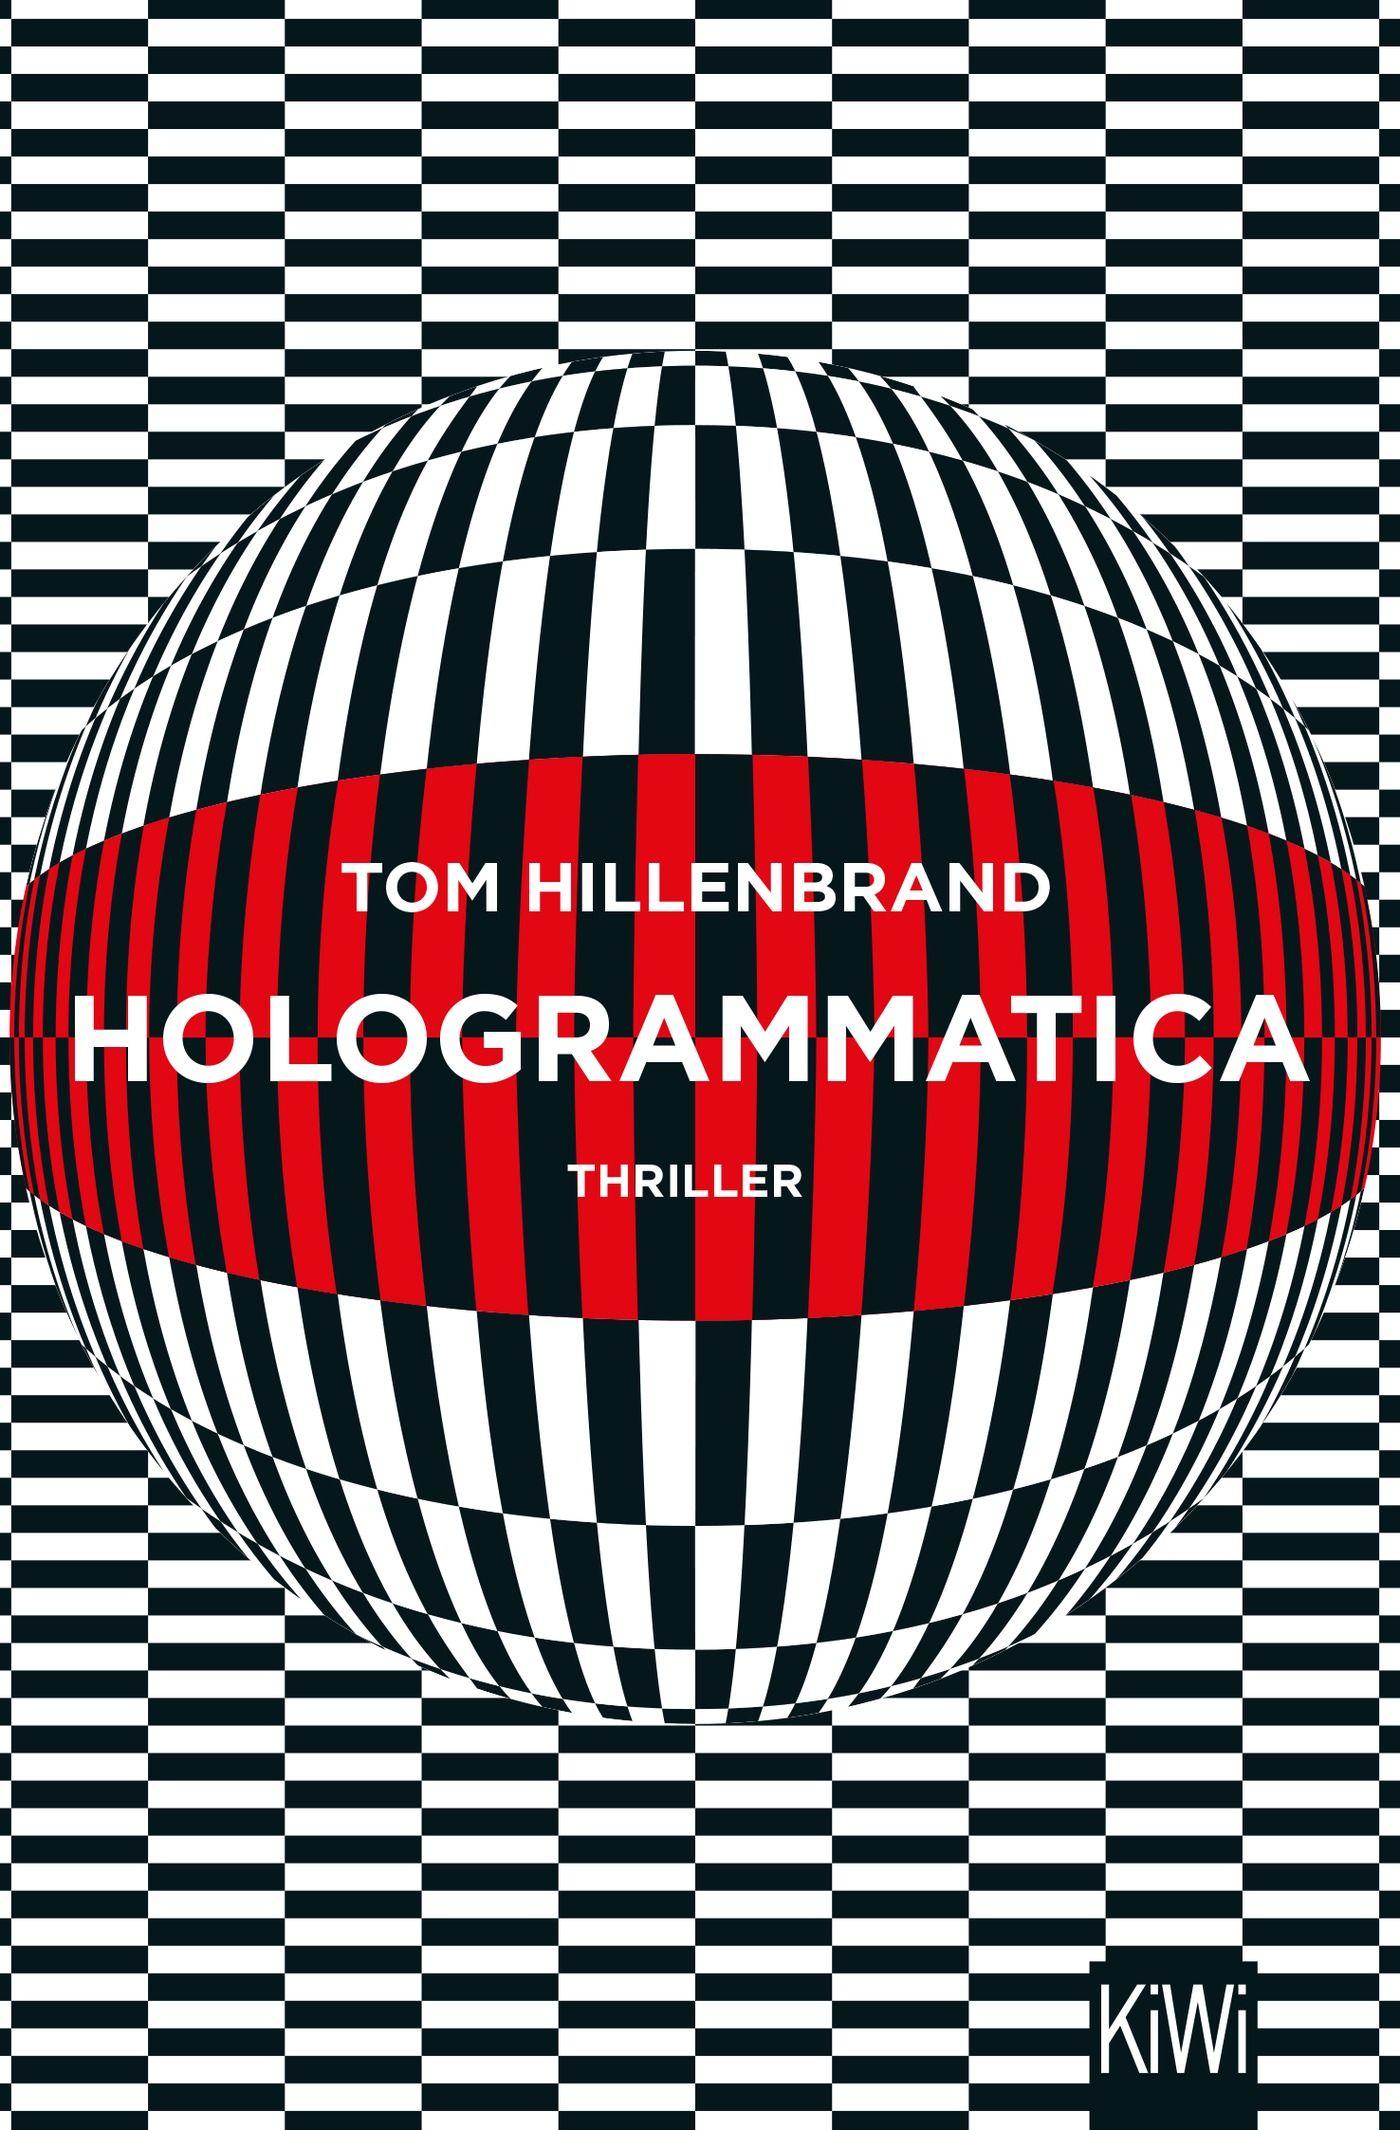 hillenbrand_tom_hologrammatica_phantastik-autoren-netzwerk.jpg